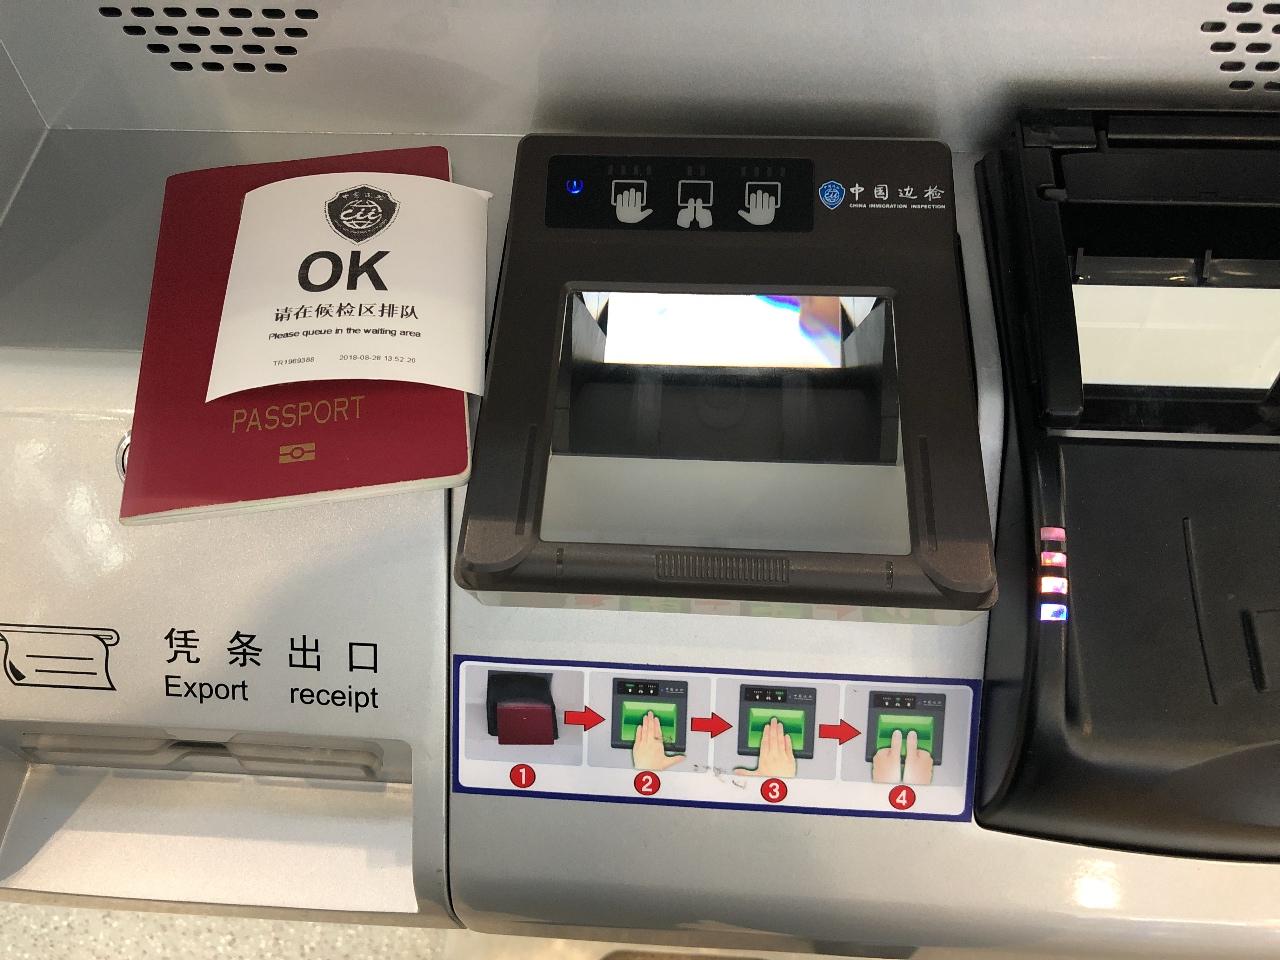 中国上海での指紋採取の実体験、「入境外国人指紋自助留在区」